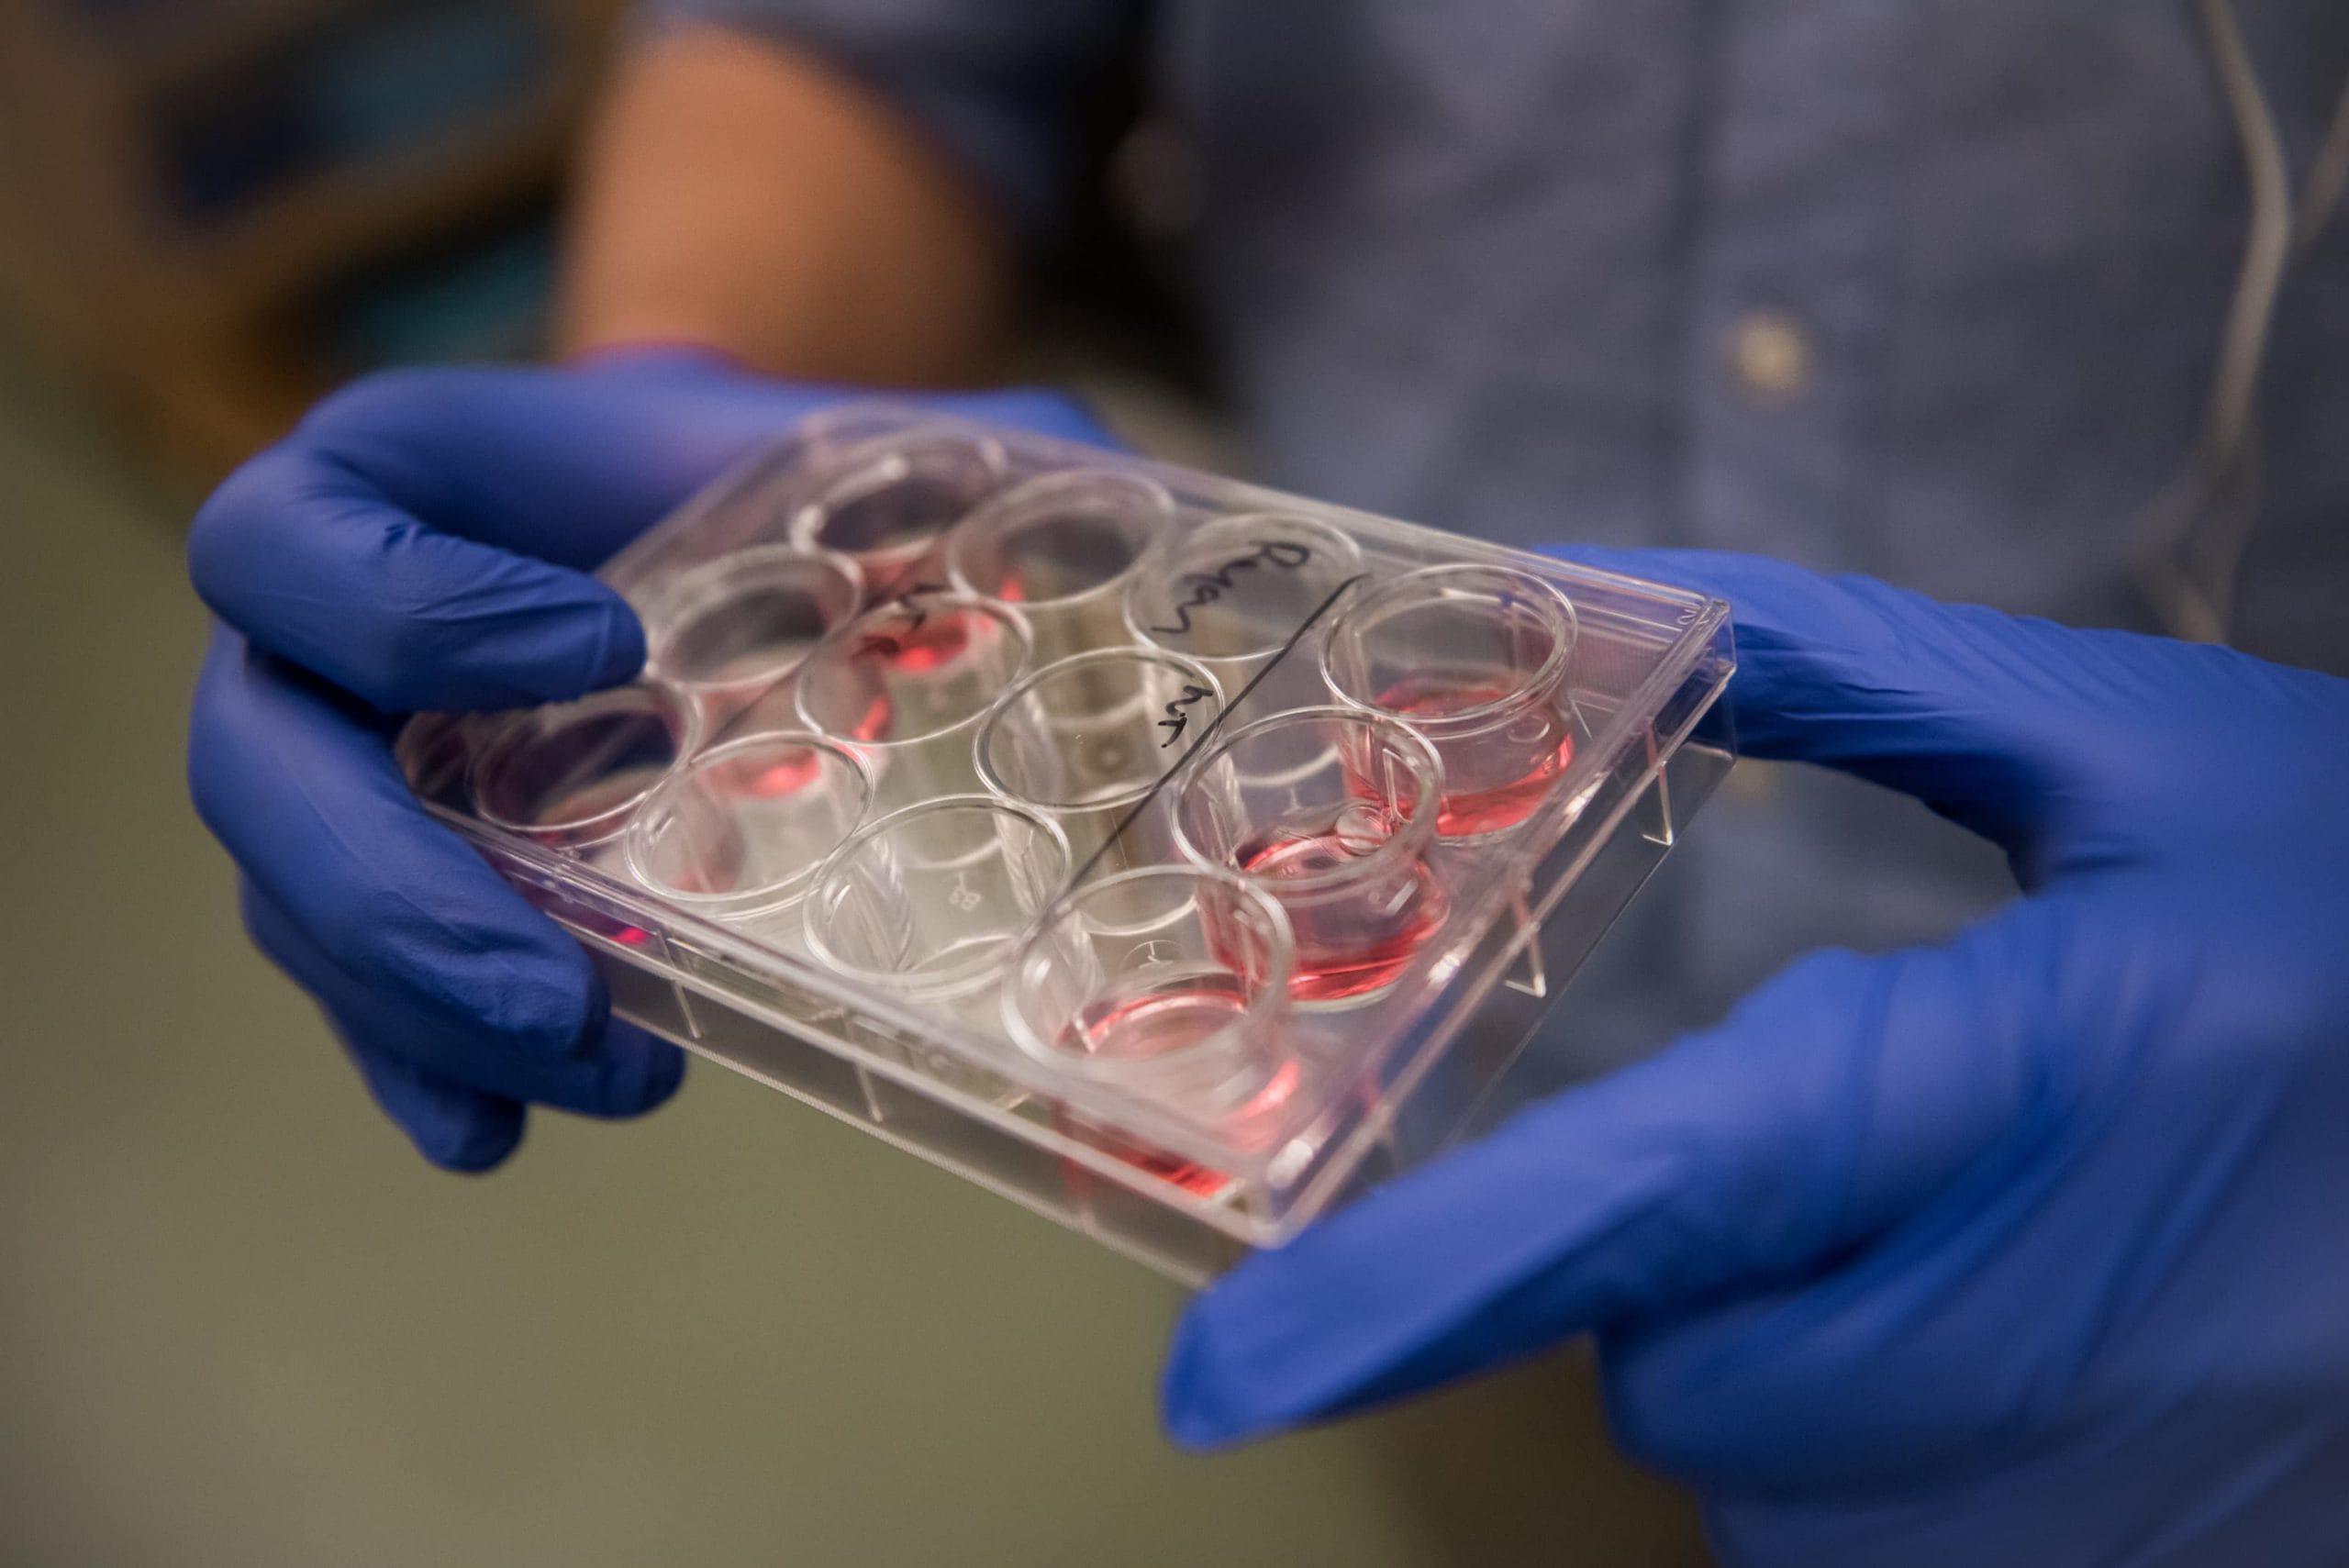 Maine Center for Biomedical Innovation